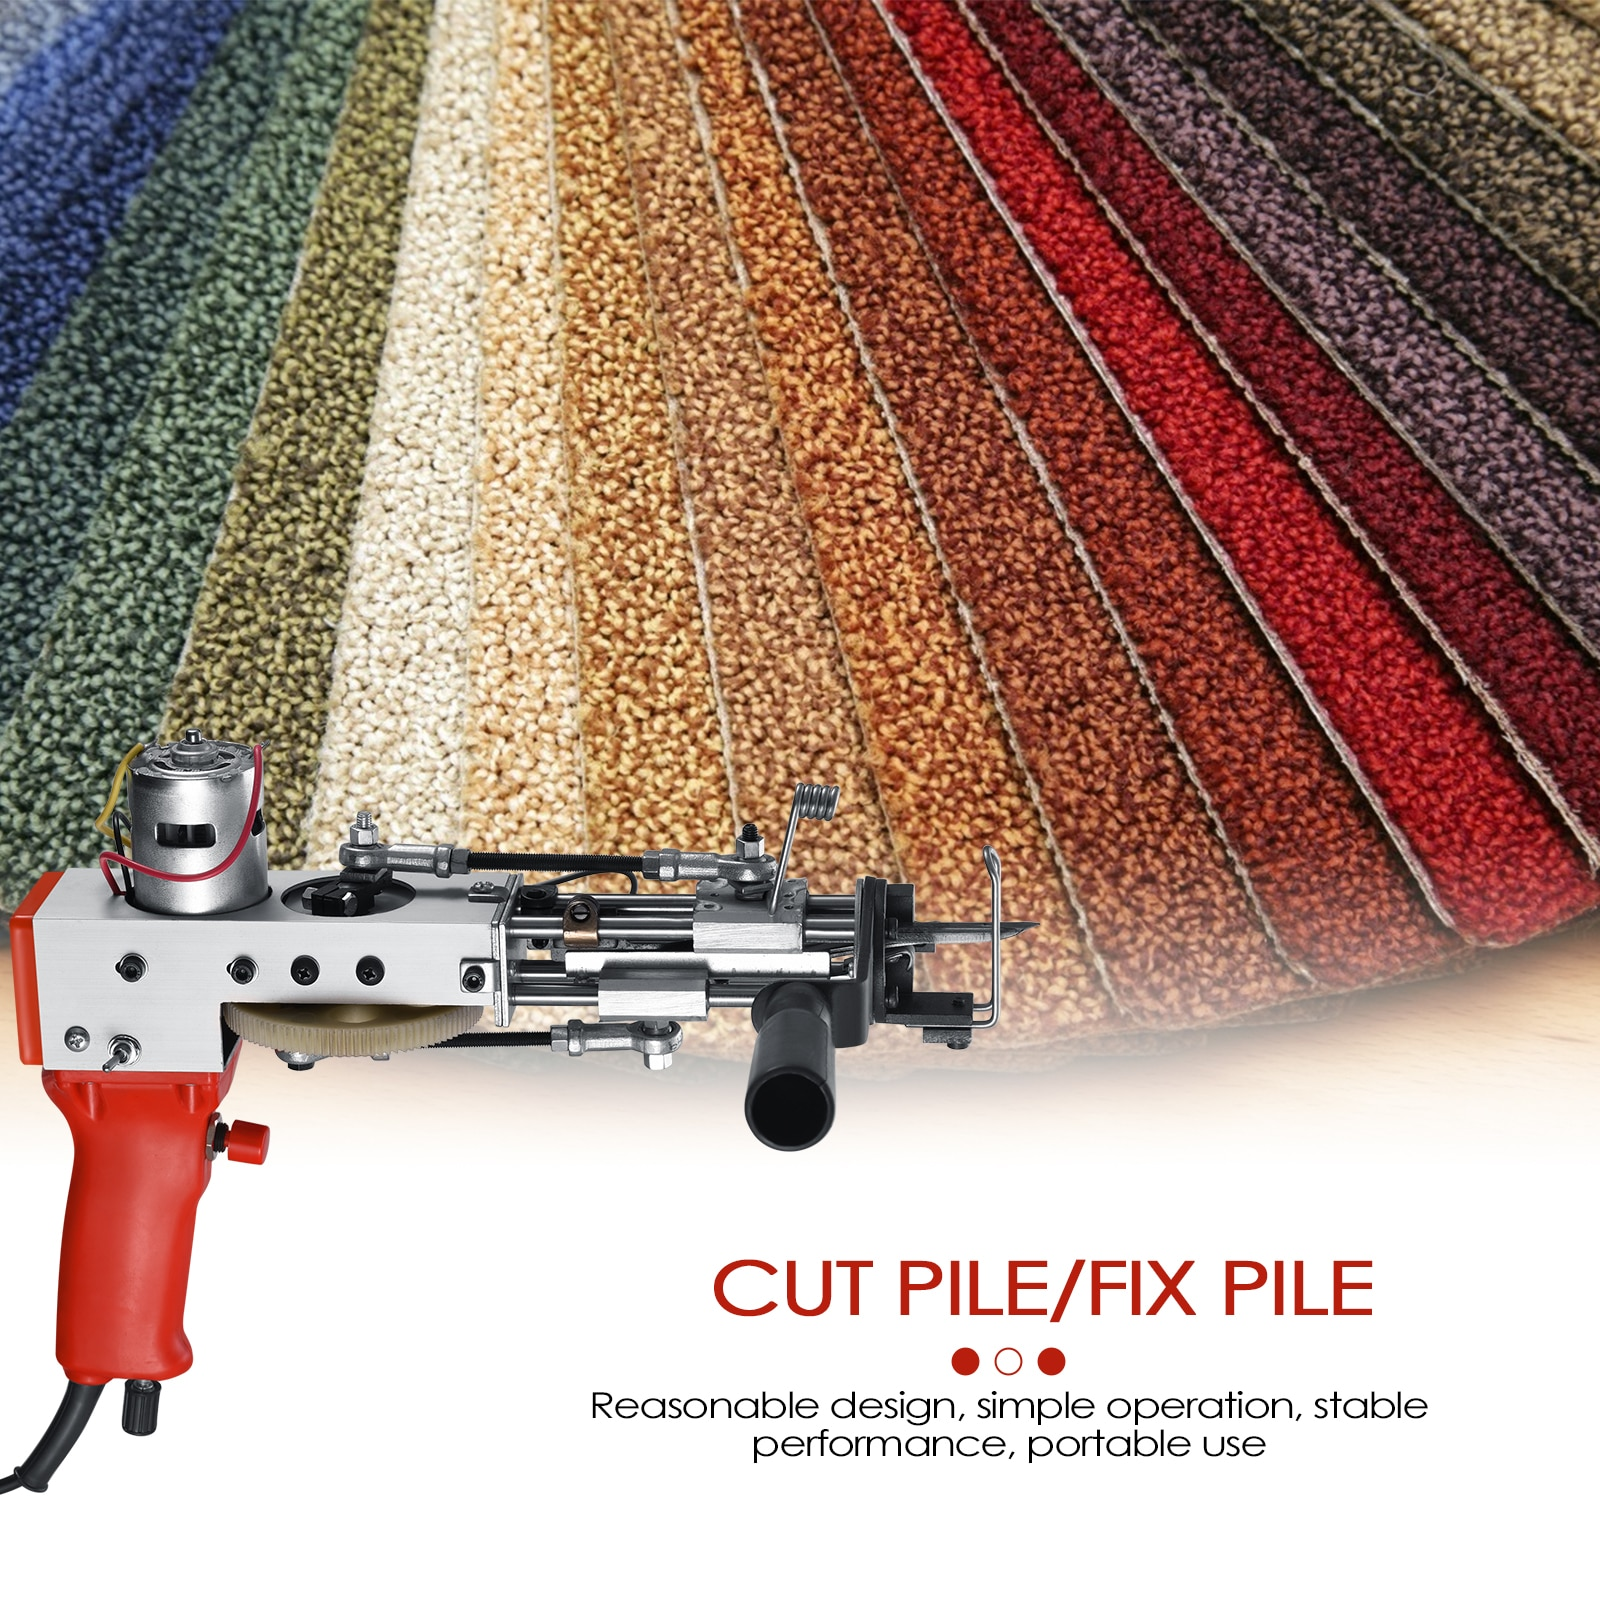 2 in 1 Tufting Gun Cut Pile and Loop Pile Rug Tufting Gun Electric Carpet Tufting Gun Home Embroidery Machine for Weaving Art enlarge